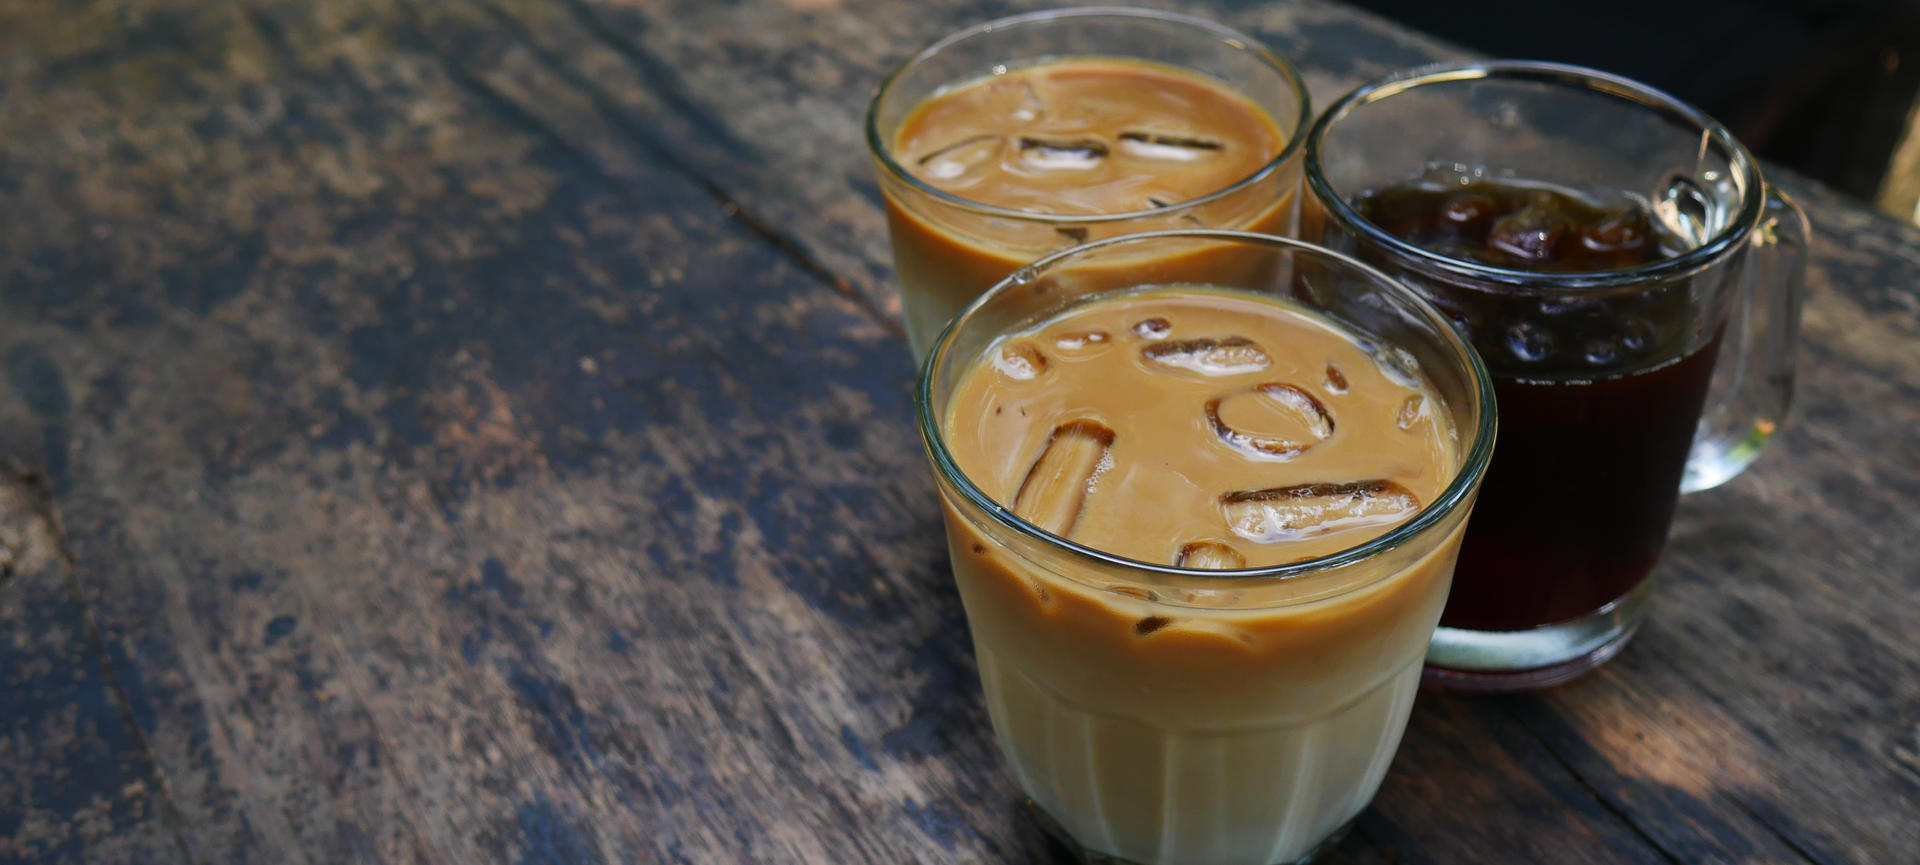 Top 3 Coffee Shops And Cafes In Bandung Near Taman Hutan Rakyat Dago